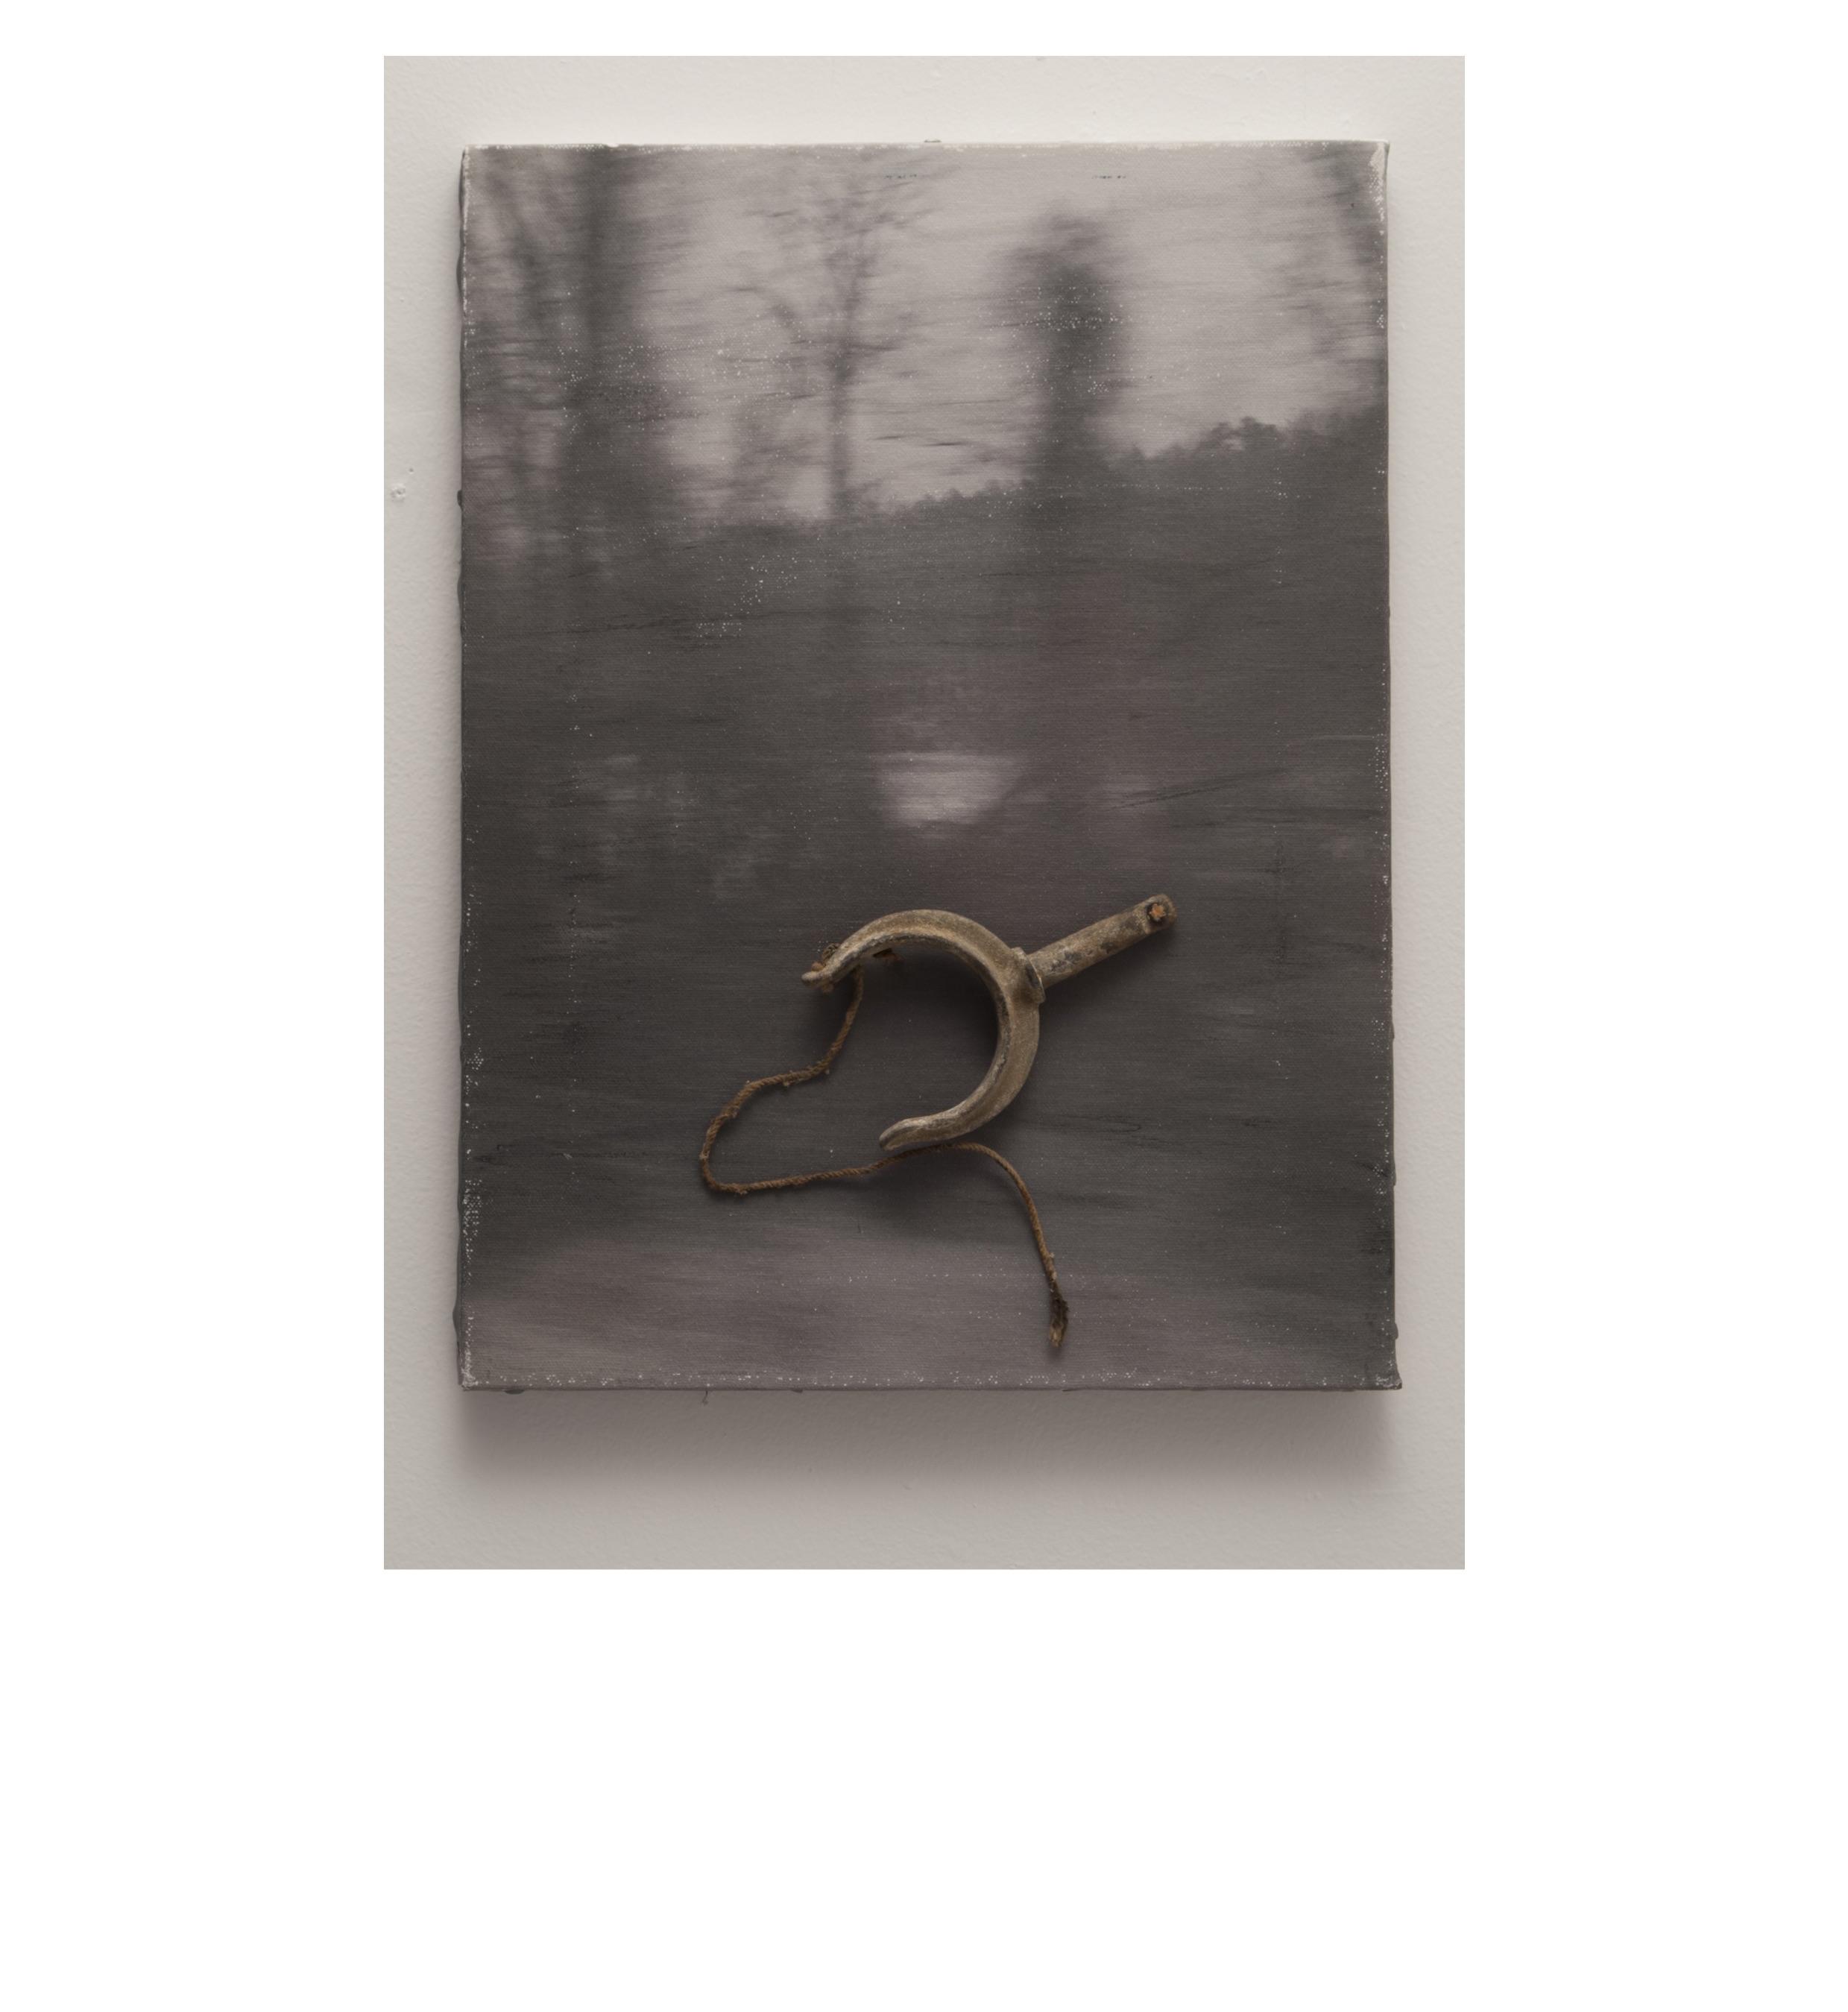 Alicia Mihai Gazcue - Eso-Bumerang (That Boomerang). 1983. Acuarela, carboncillo y objeto sobre lienzo. 31 x 40 cm. Único